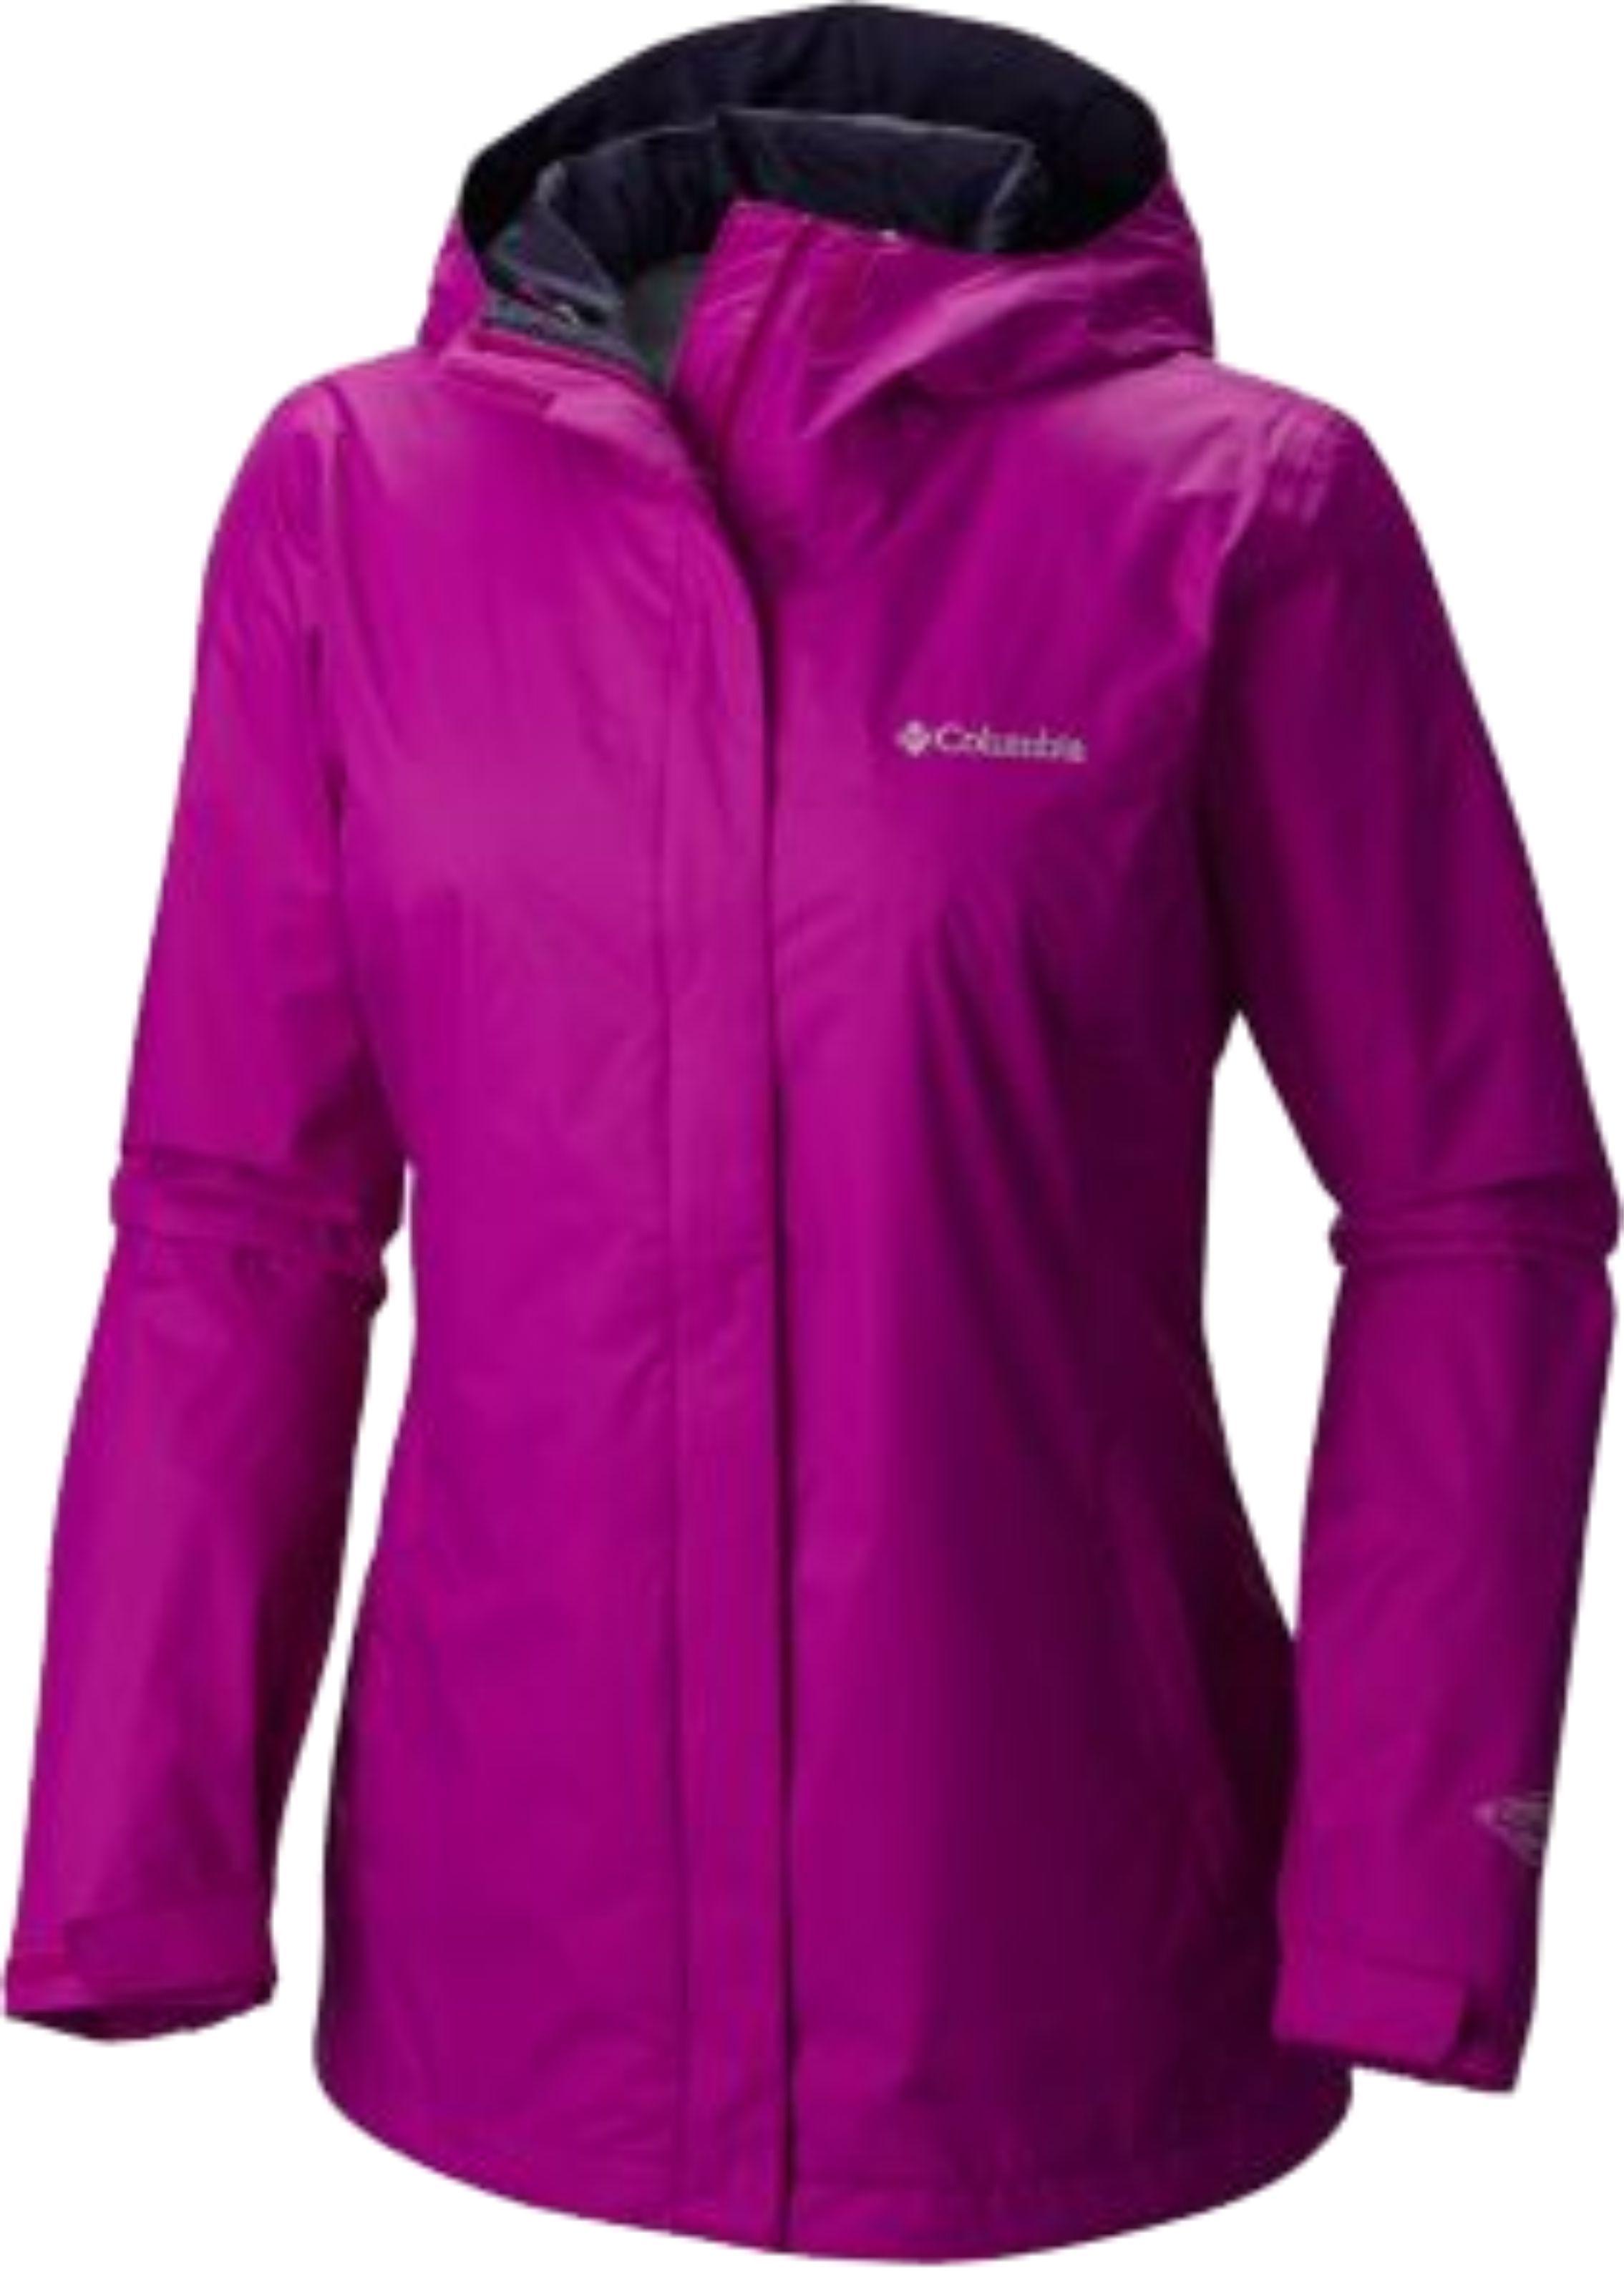 Women S Arcadia Ii Rain Jacket Bright Plum Waterproof Breathable Guaranteed Rain Jacket Women Rain Jacket Raincoats For Women